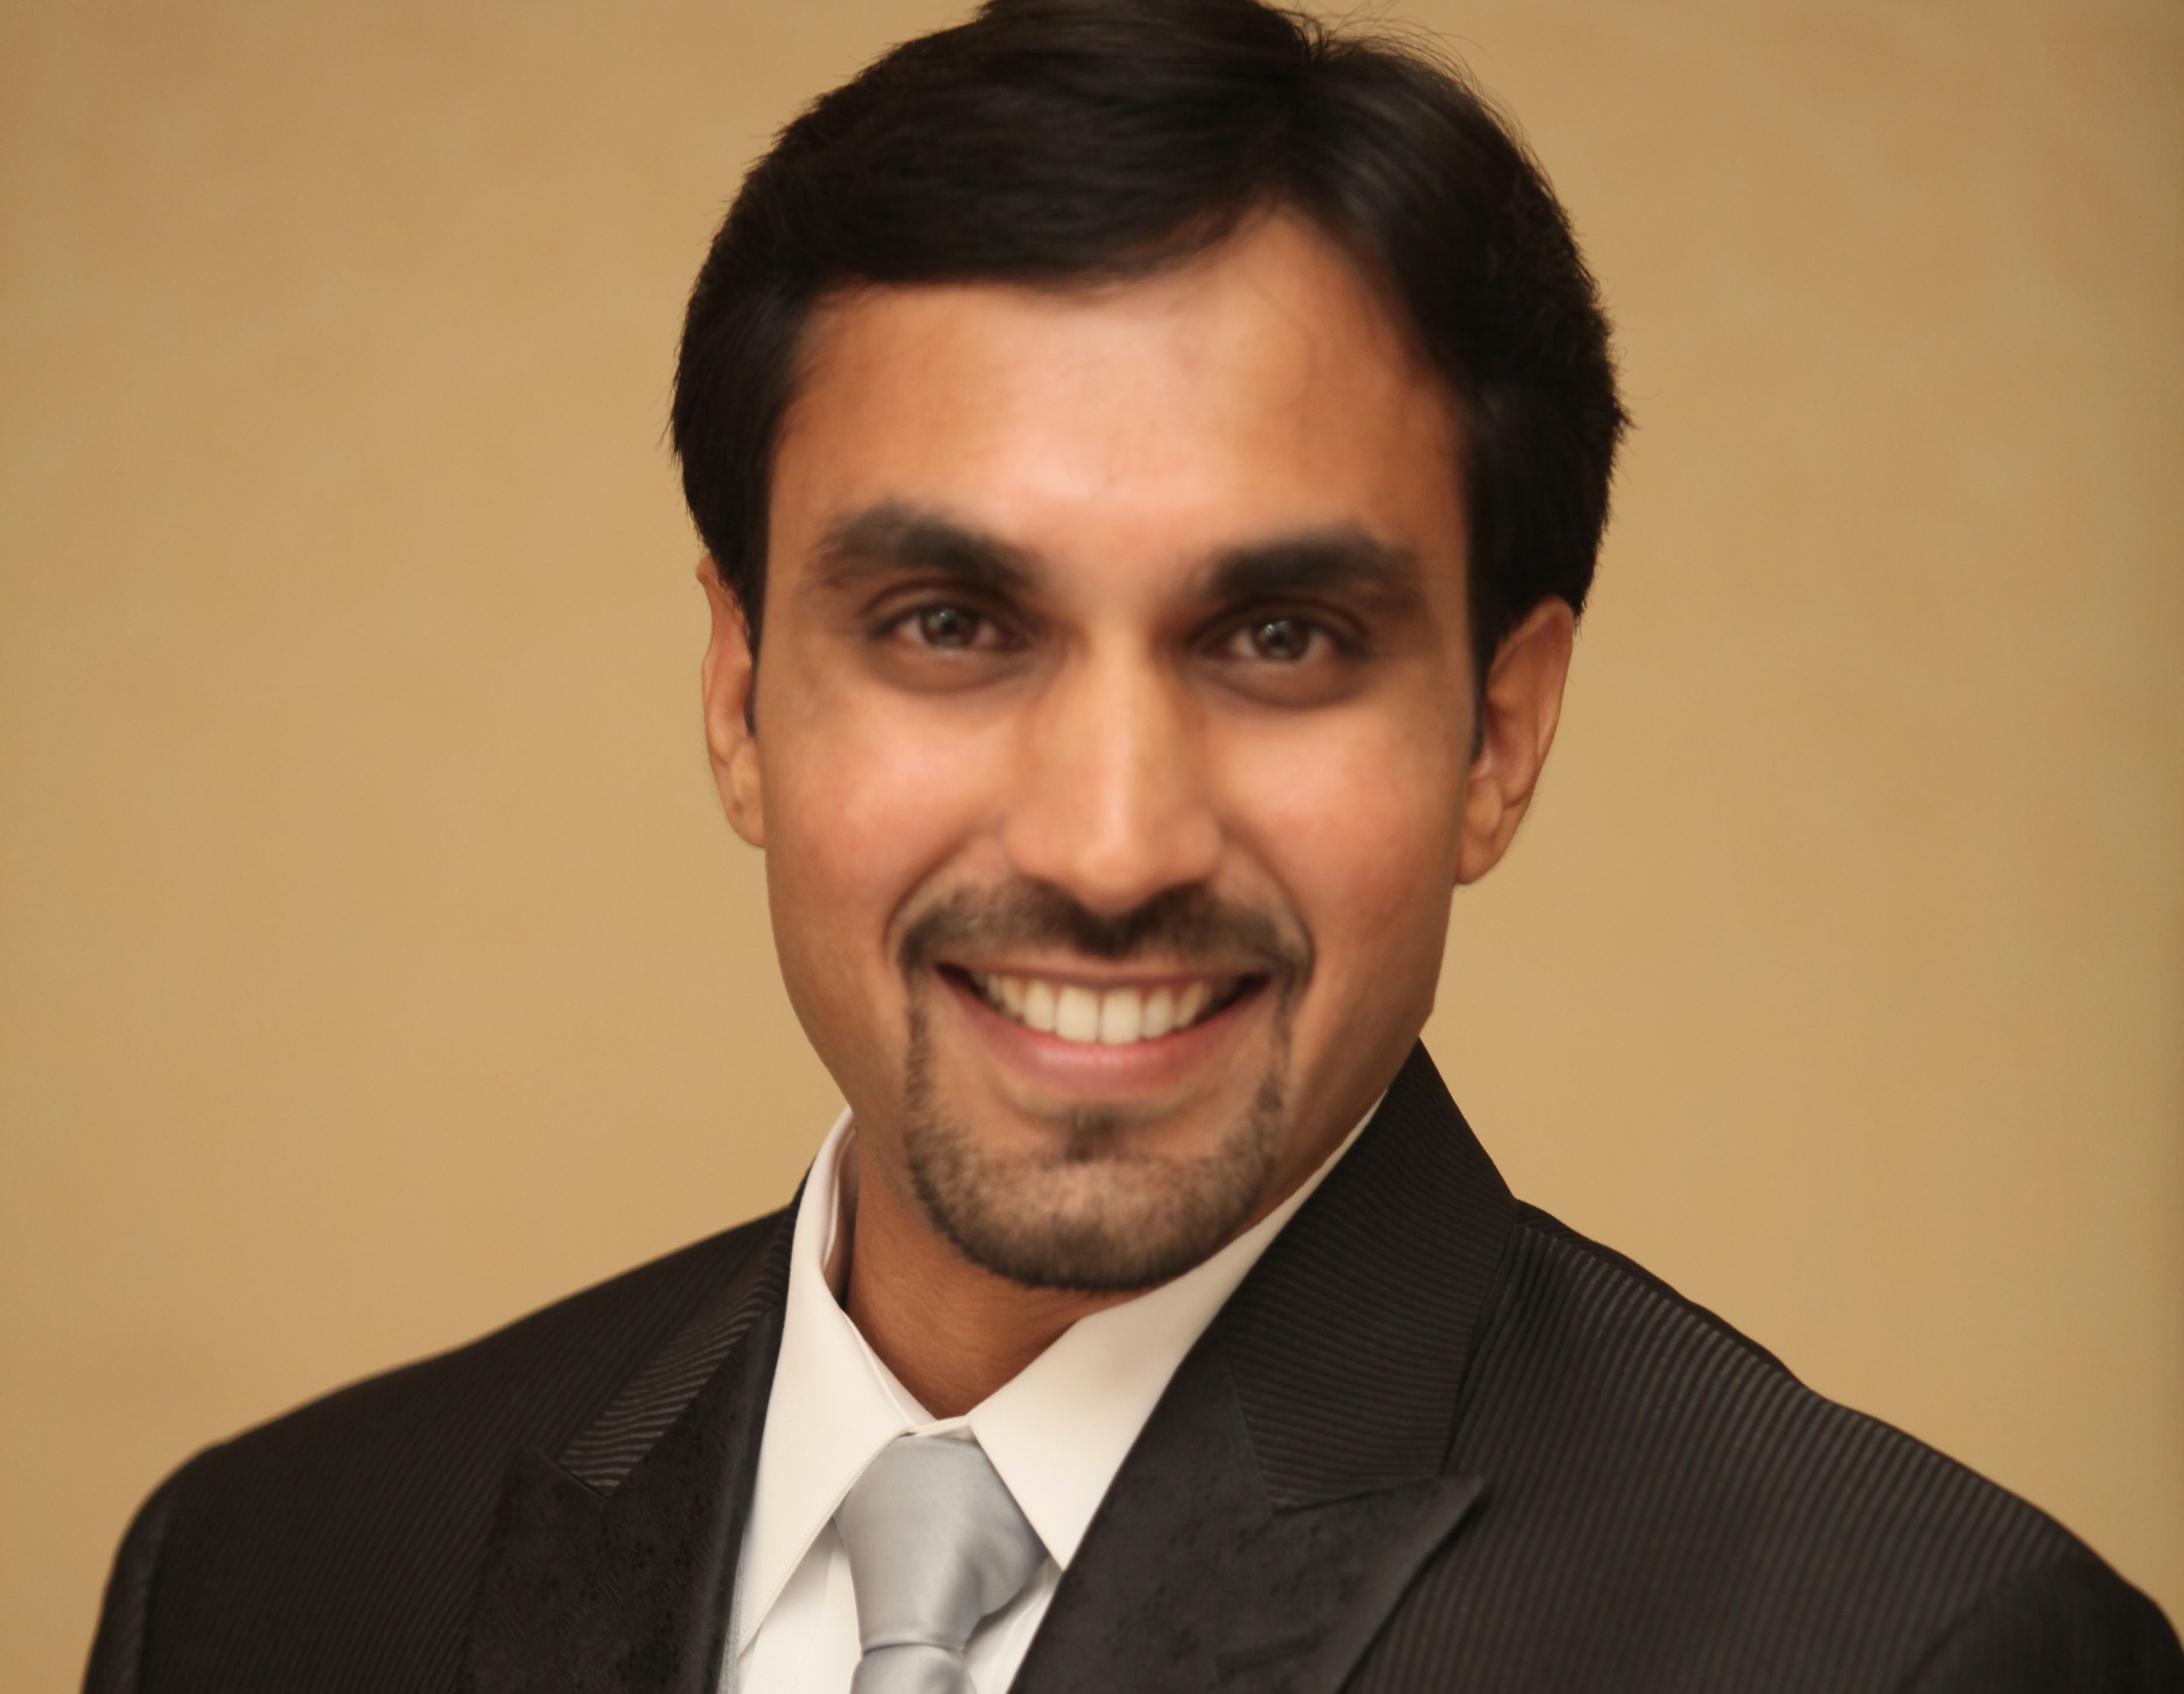 Nishant N. Mehta